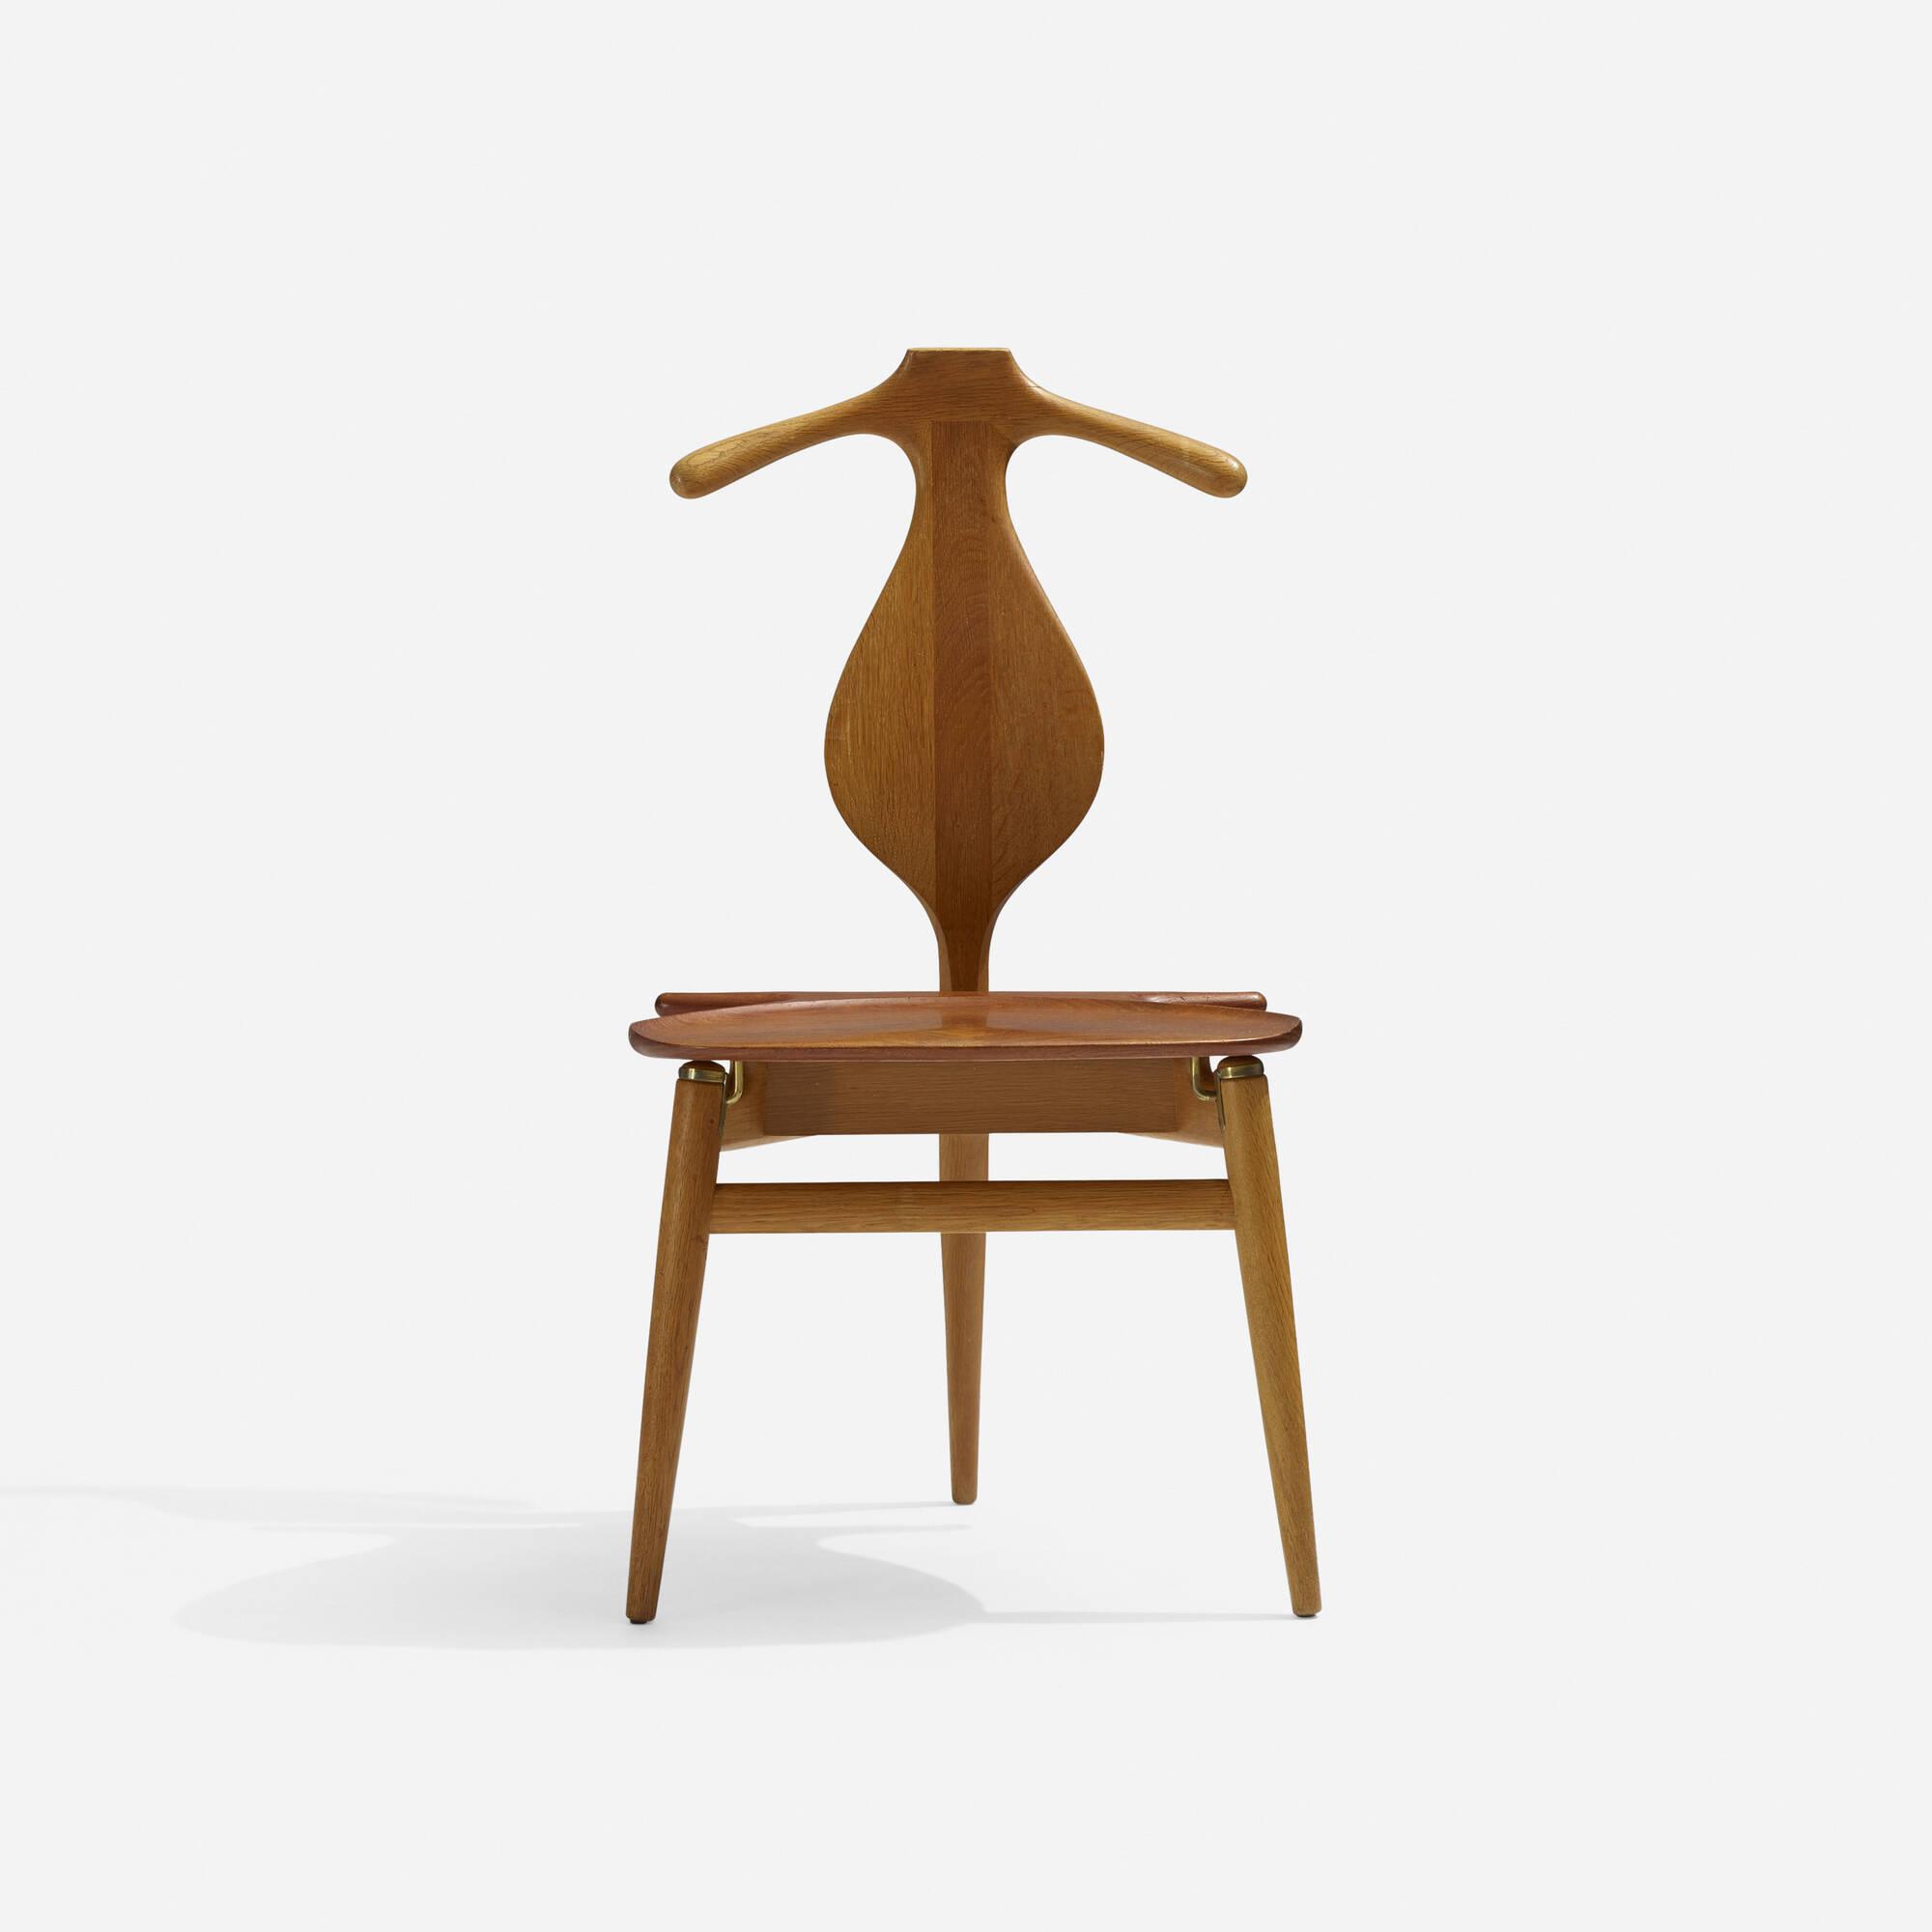 255: Hans J. Wegner / Valet chair (1 of 4)